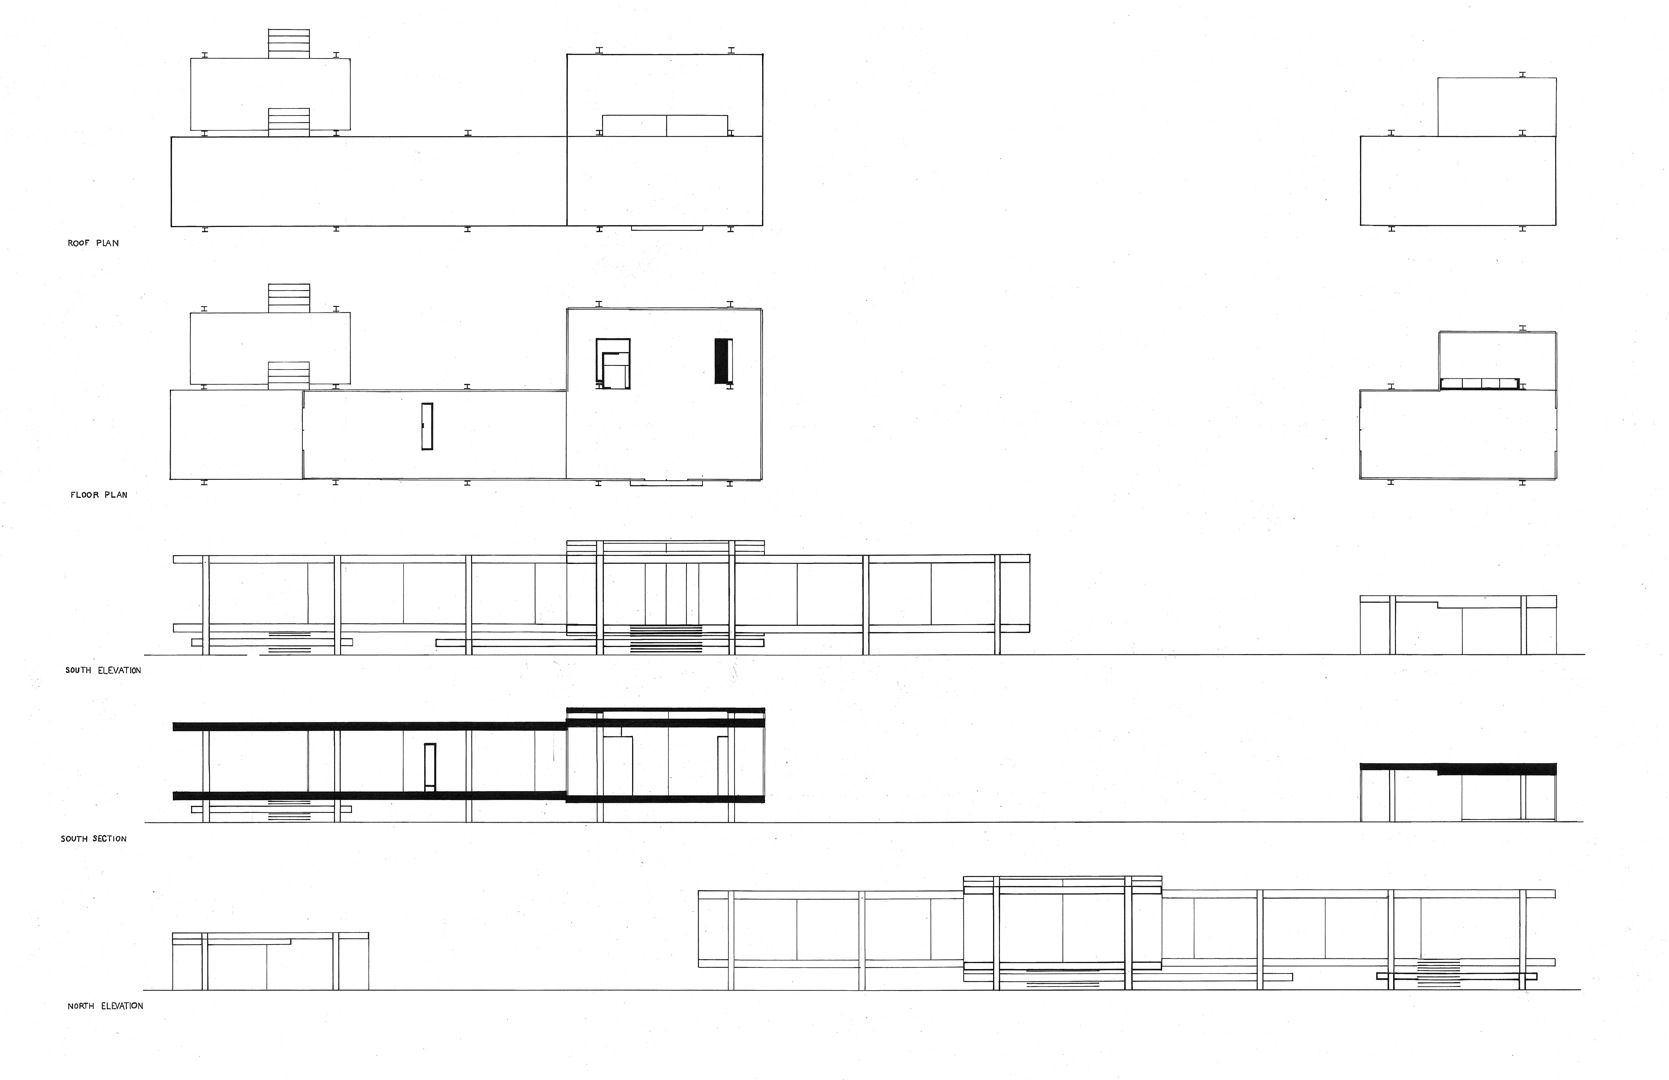 farnsworth house general plan mies inspiration pinterest farnsworth house architecture. Black Bedroom Furniture Sets. Home Design Ideas